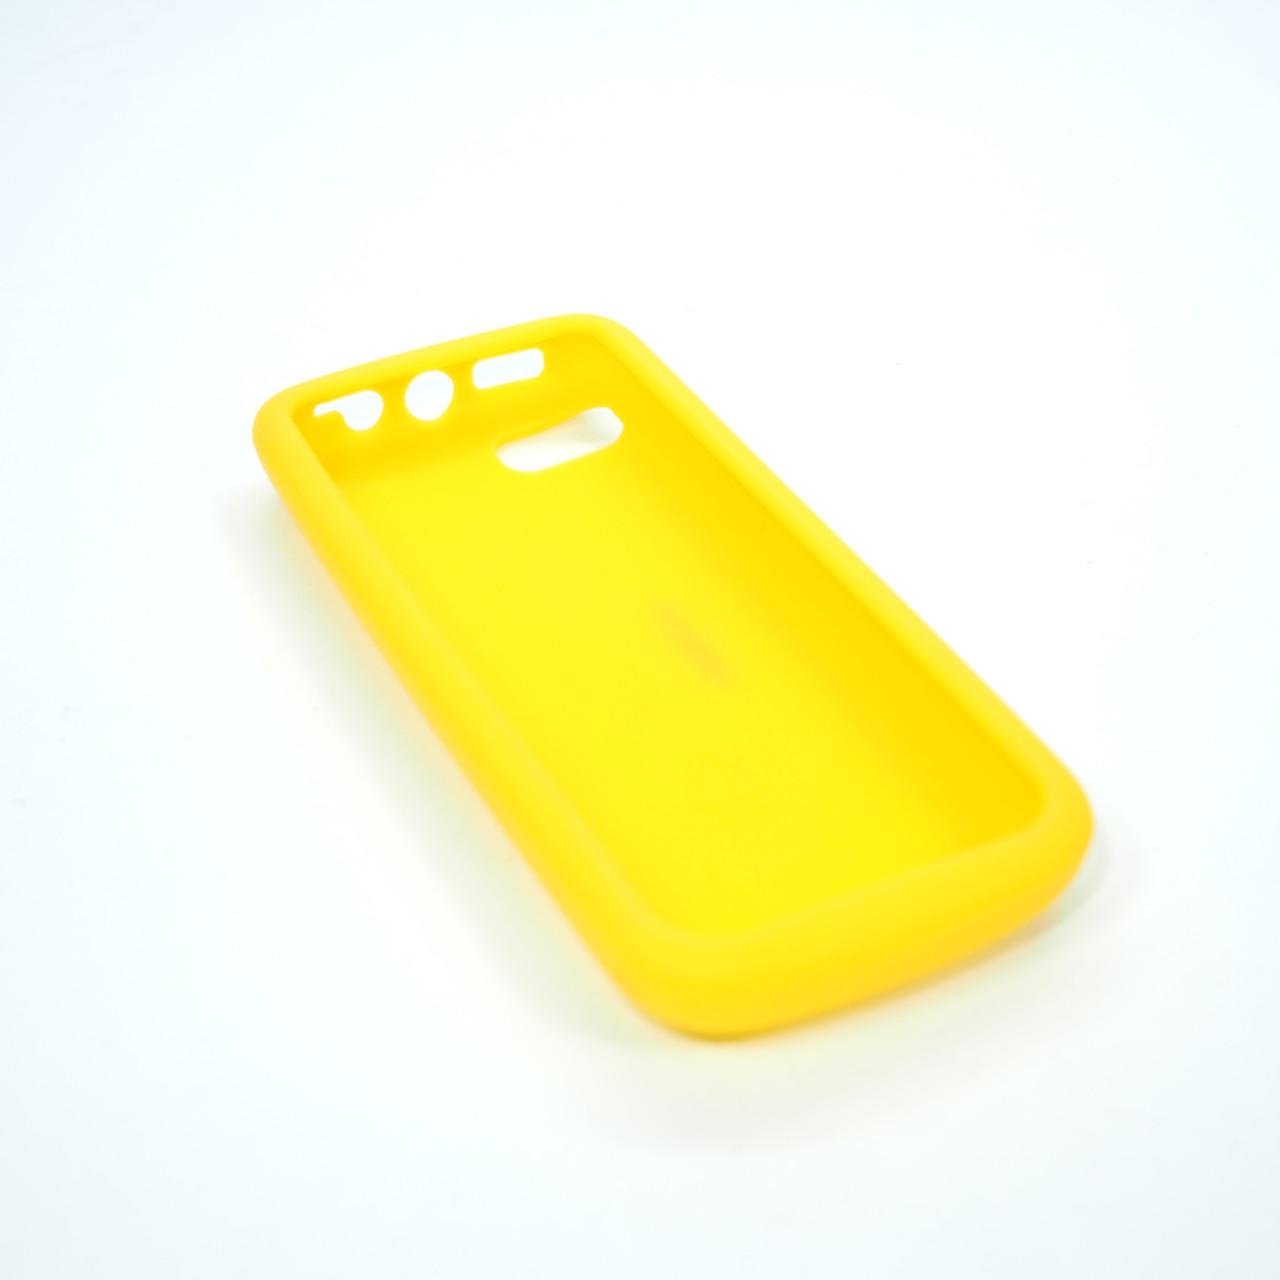 Nokia CC-1014 C3-01 Silicone Cover yellow